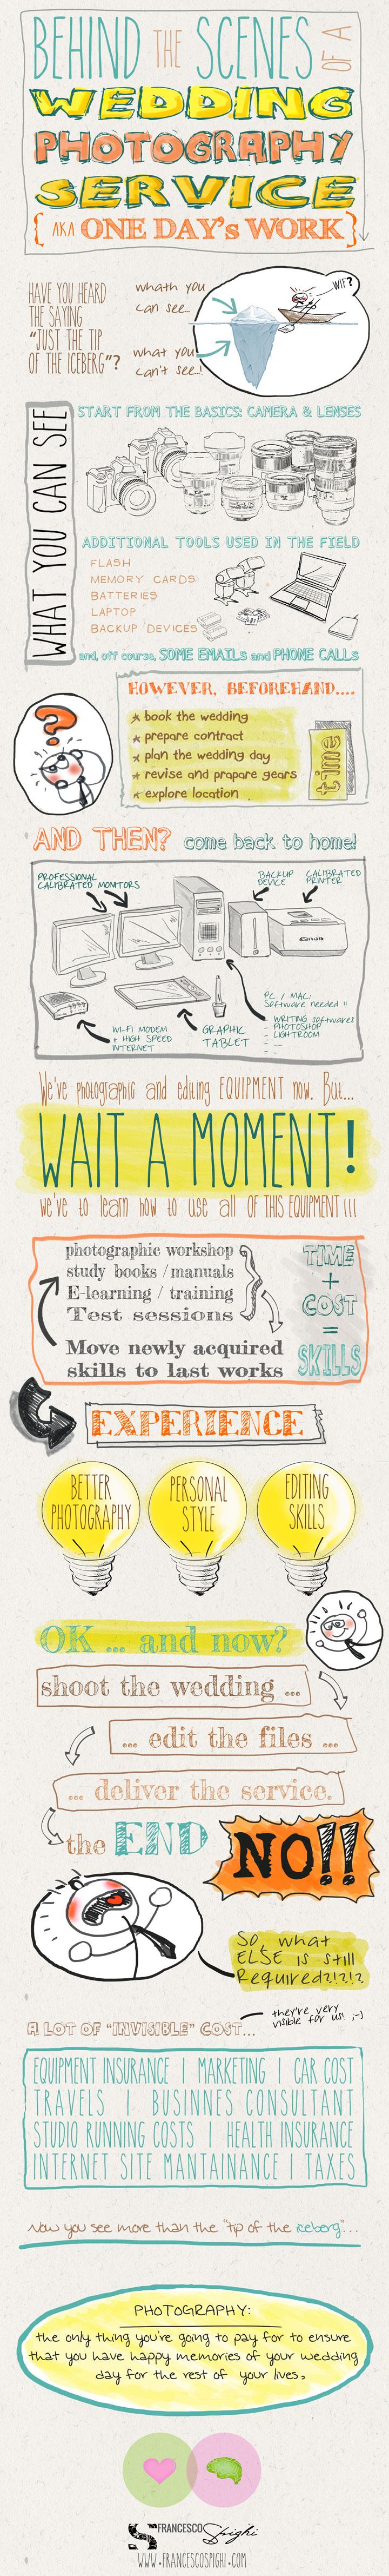 wedding-photography-hard-word-infographic